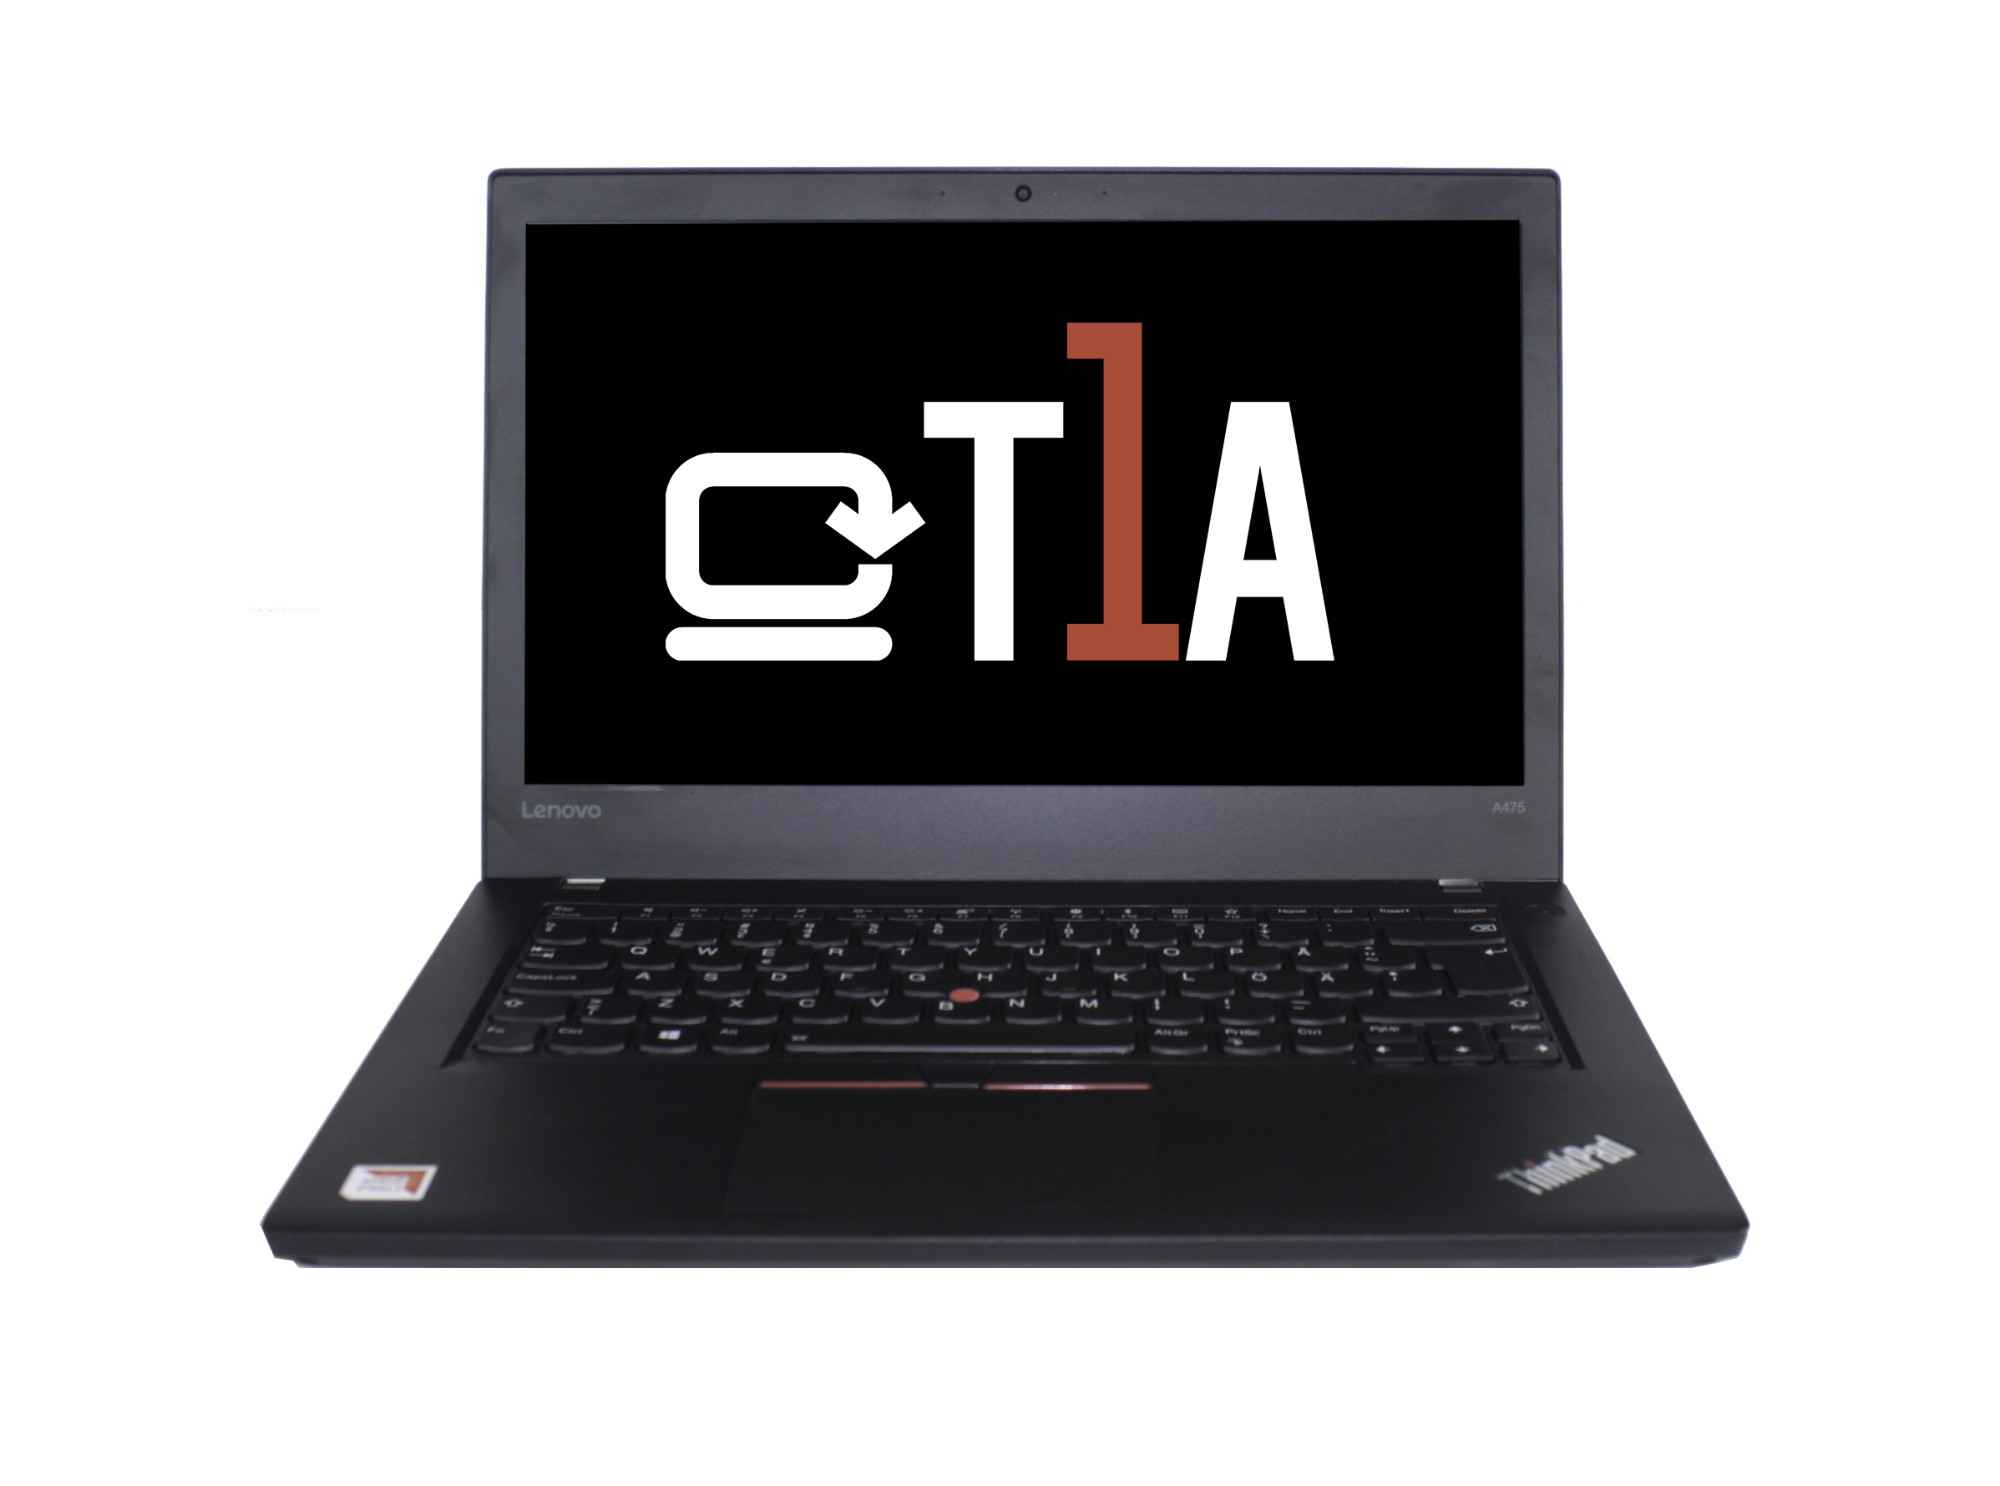 T1A Lenovo ThinkPad A475 Refurbished Notebook 35.6 cm (14